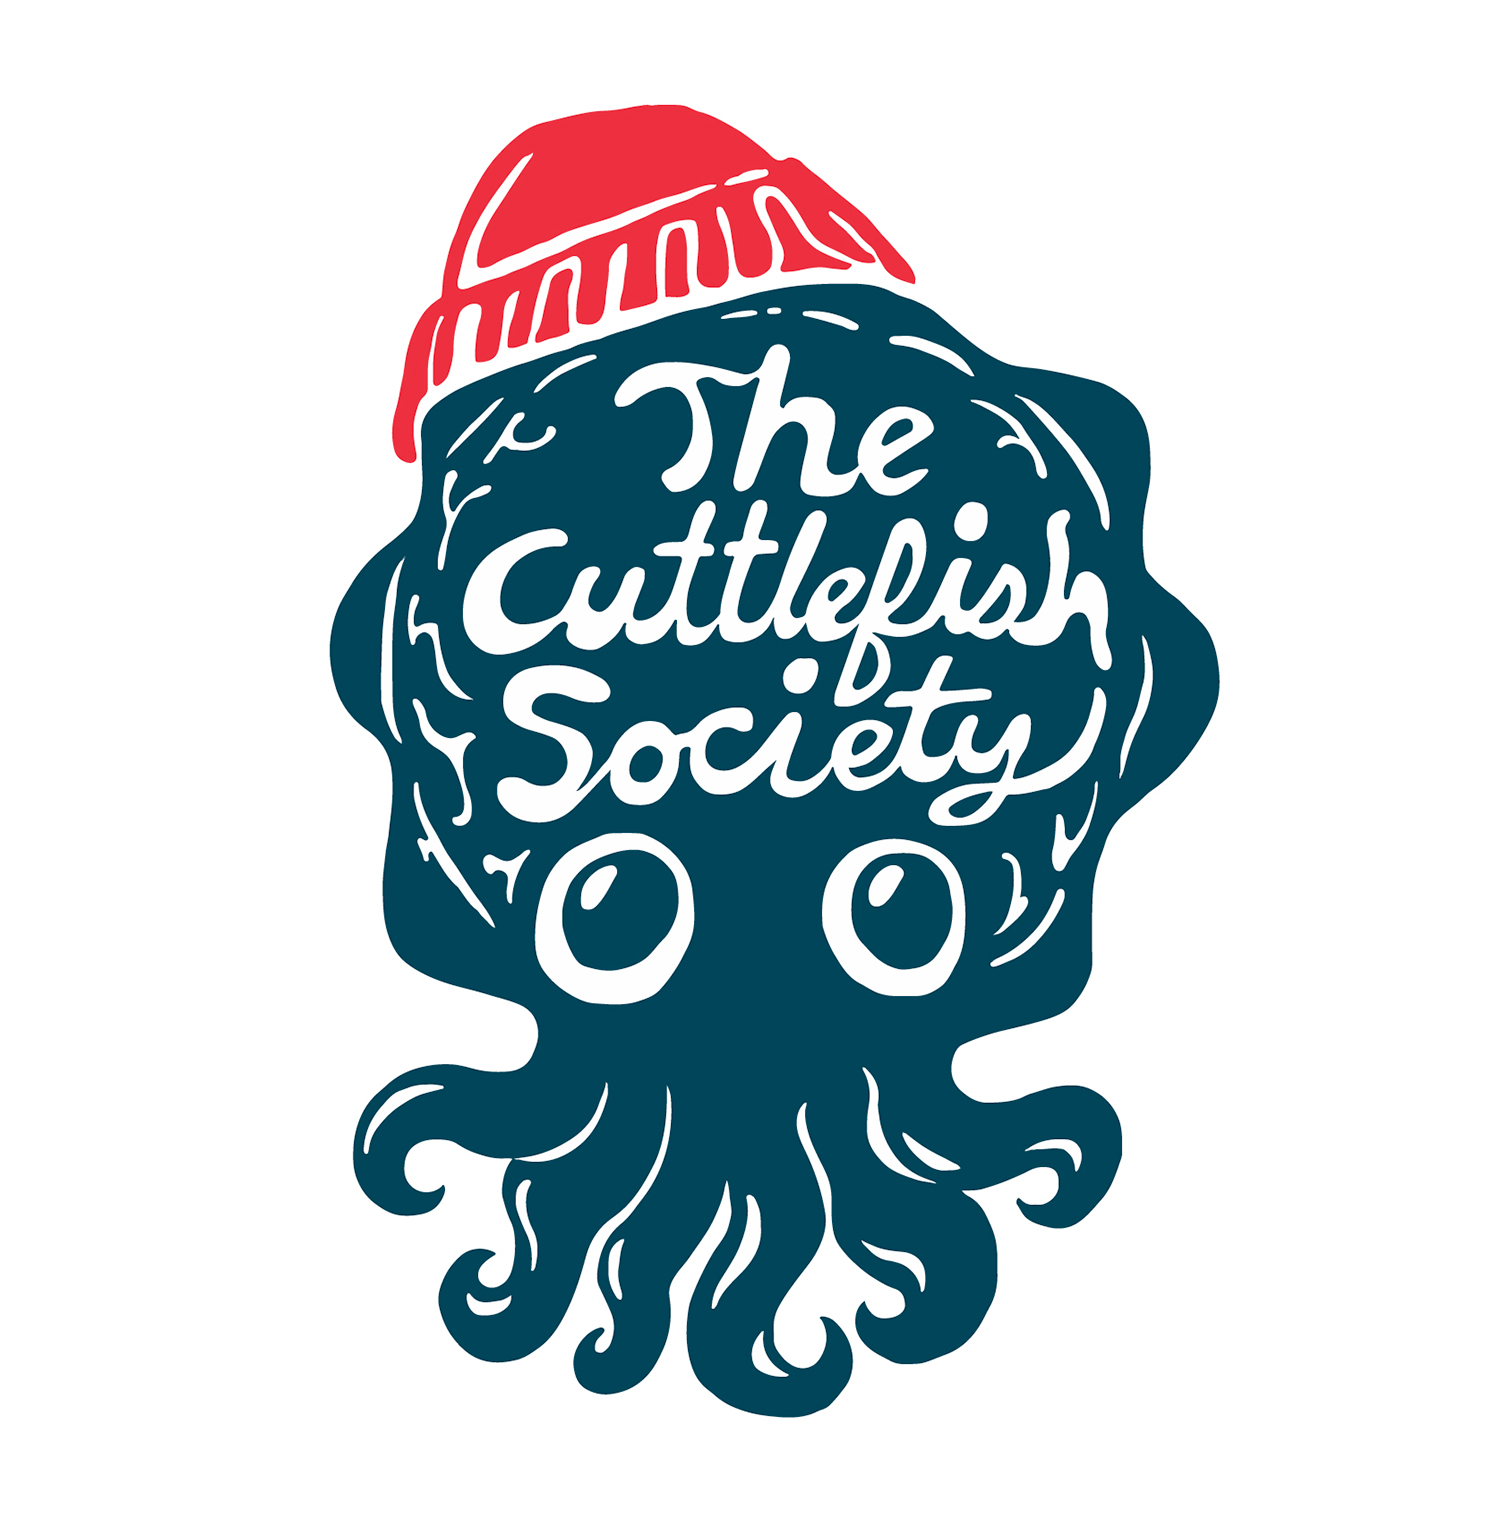 Taylor-Baldry-Cuttlefish_Society_Logo.jpg